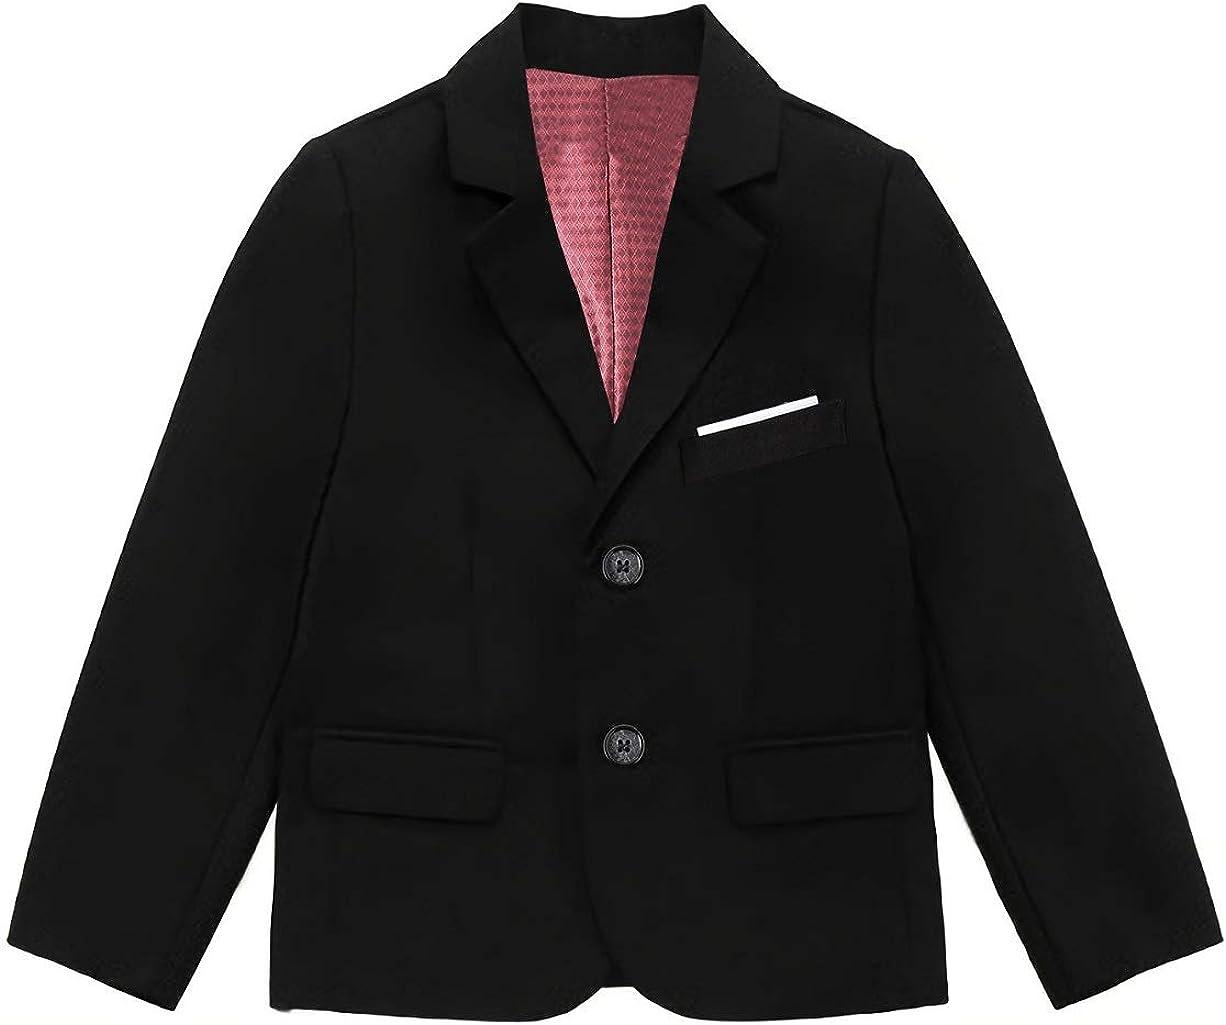 Fersumm Boys' Formal Solid Color Uniform Blazer Jacket Co NEW before Ranking TOP8 selling ☆ School